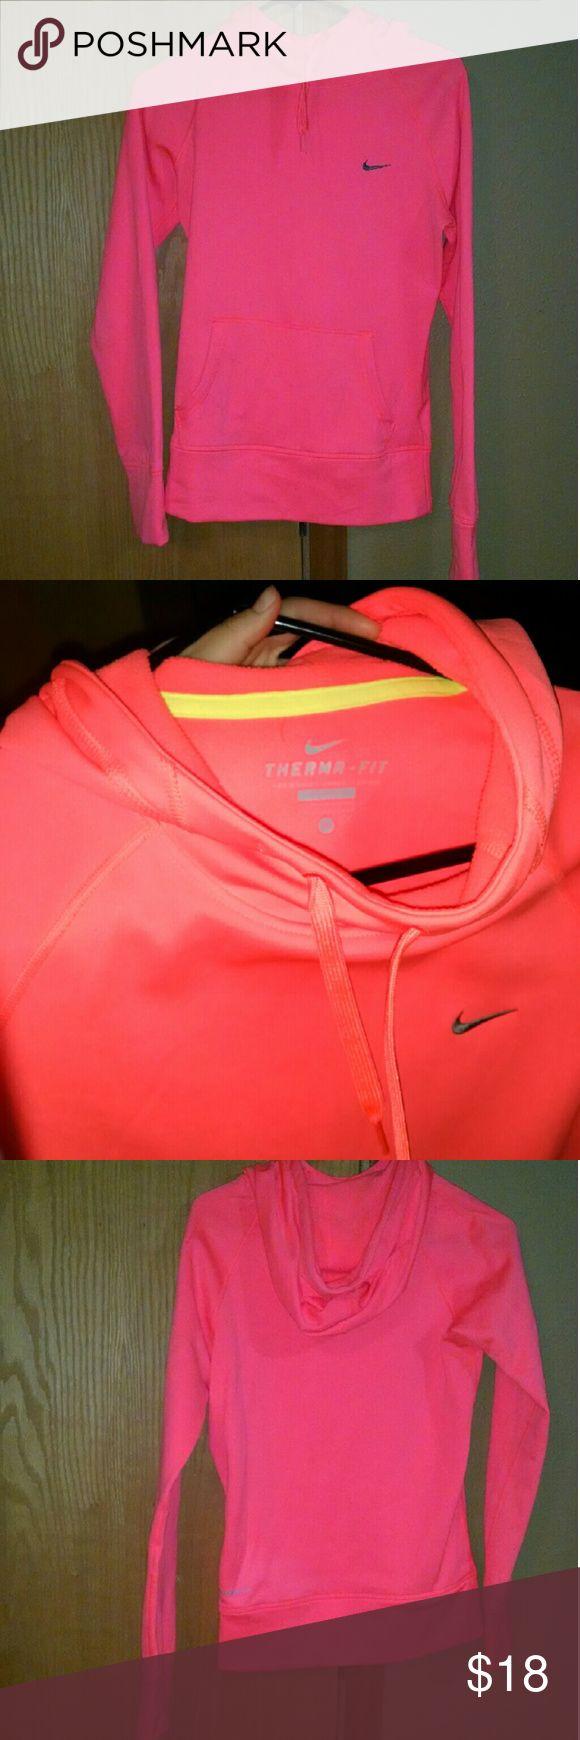 Women's nike sweatshirt Women's bright orange Nike sweatshirt. very warm and cozy. Great shape!! Nike Tops Sweatshirts & Hoodies